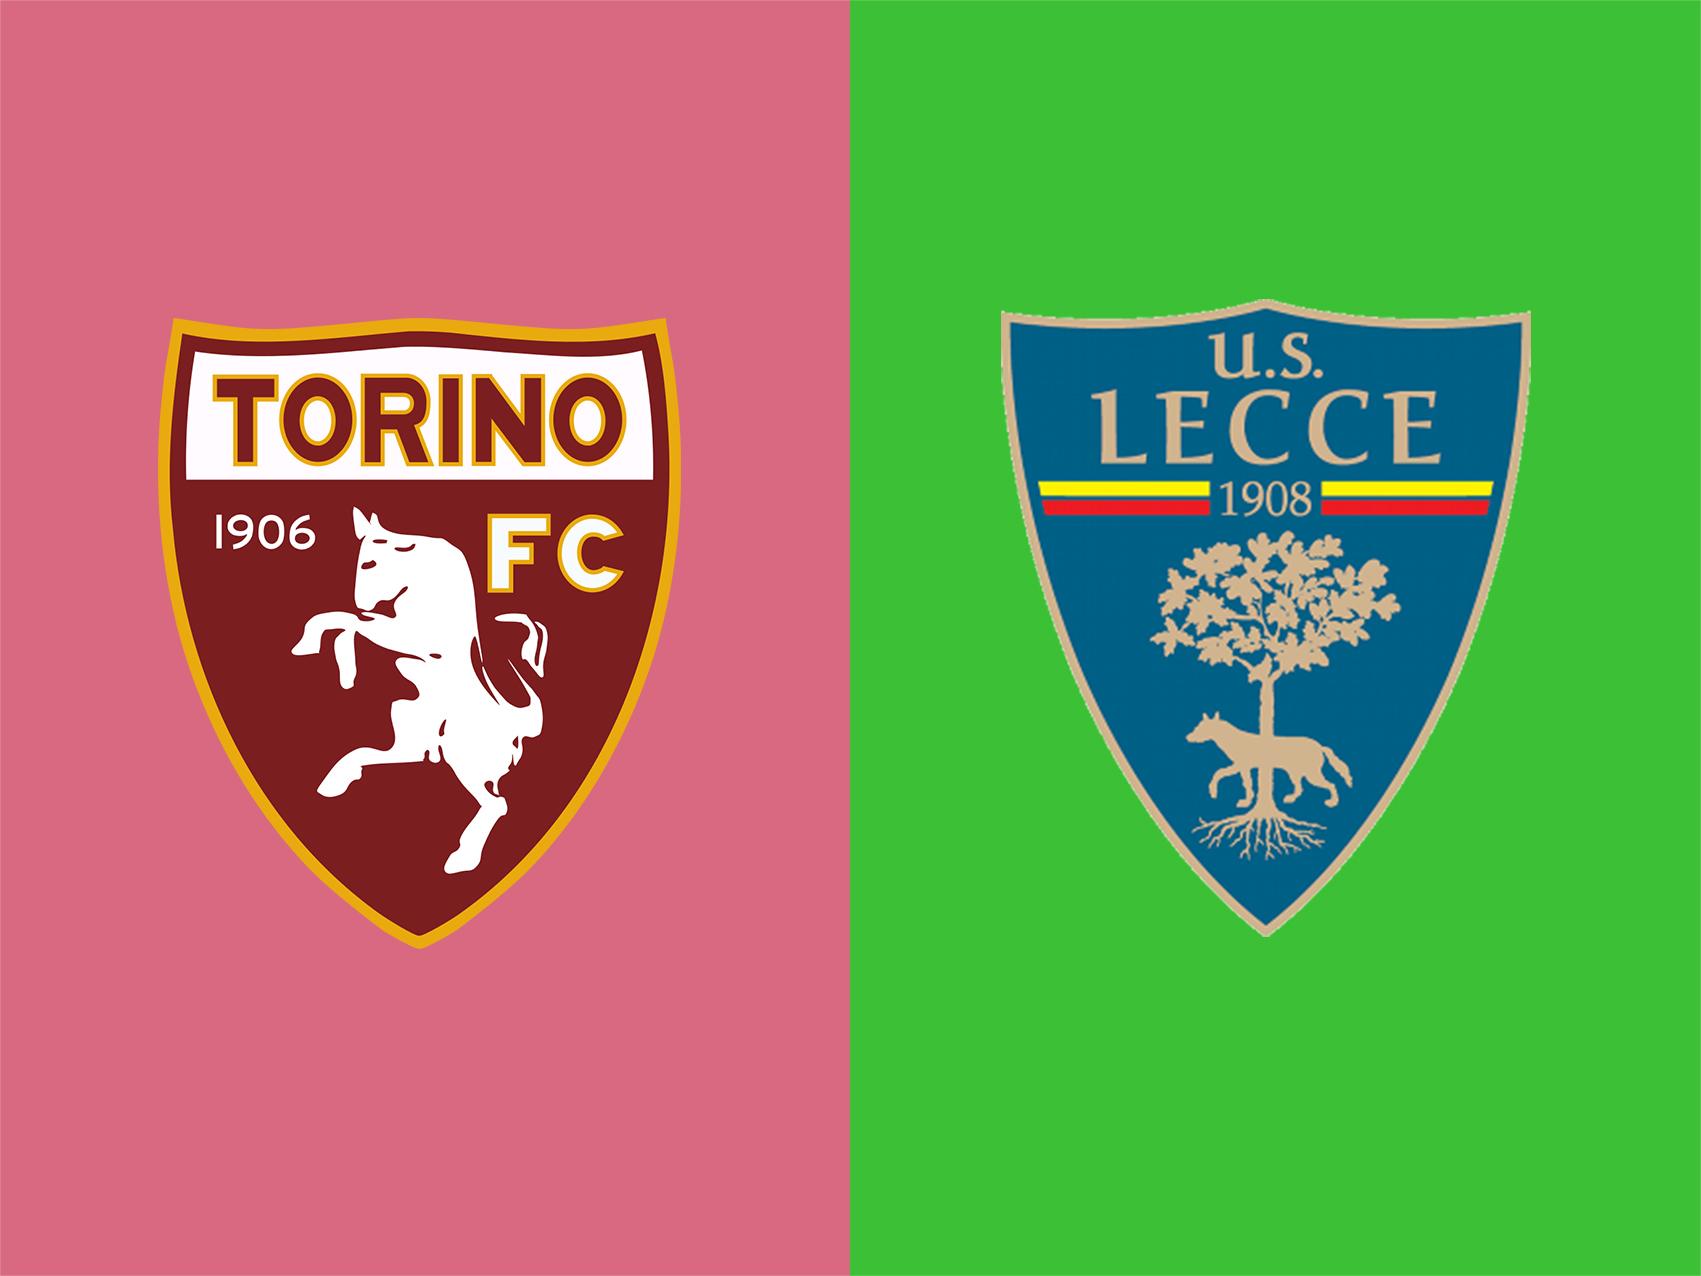 soi-keo-ca-cuoc-bong-da-ngay-14-9-Torino-vs-Lecce-do-it-thang-do-nhieu-b9